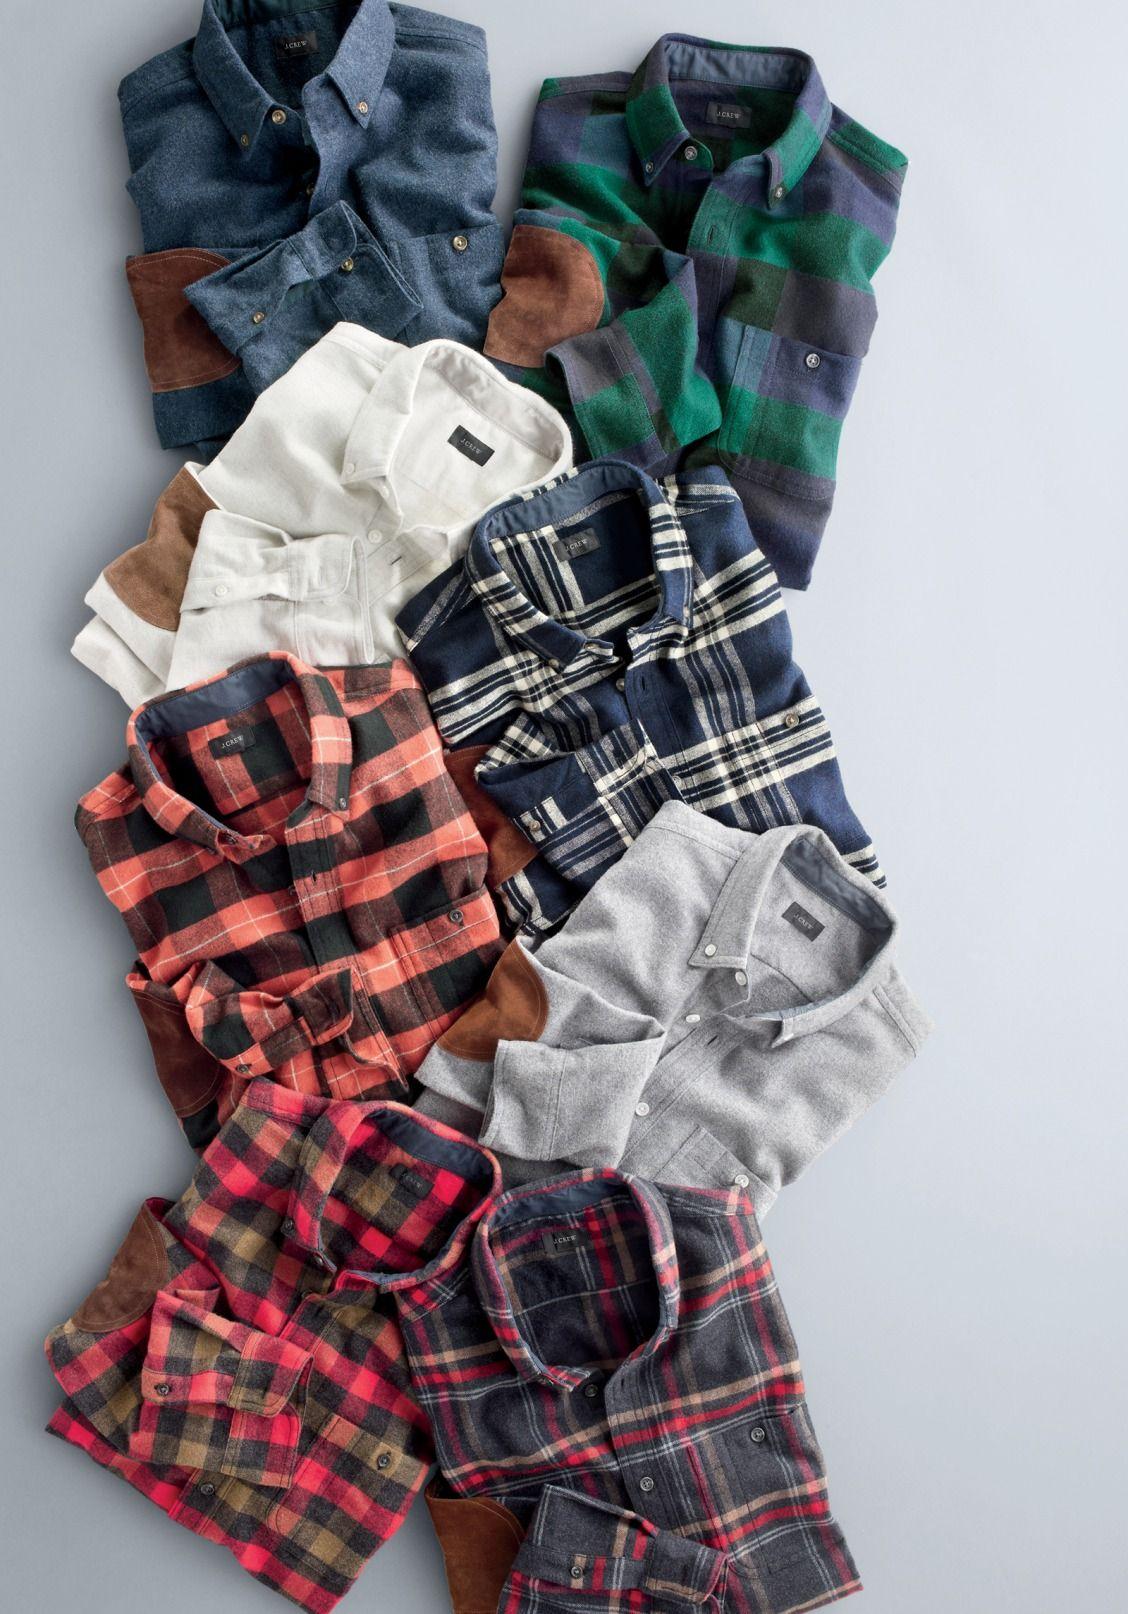 Flannel jacket with elbow patches  JCrew menus elbowpatch shirts  Menus Fashion  Pinterest